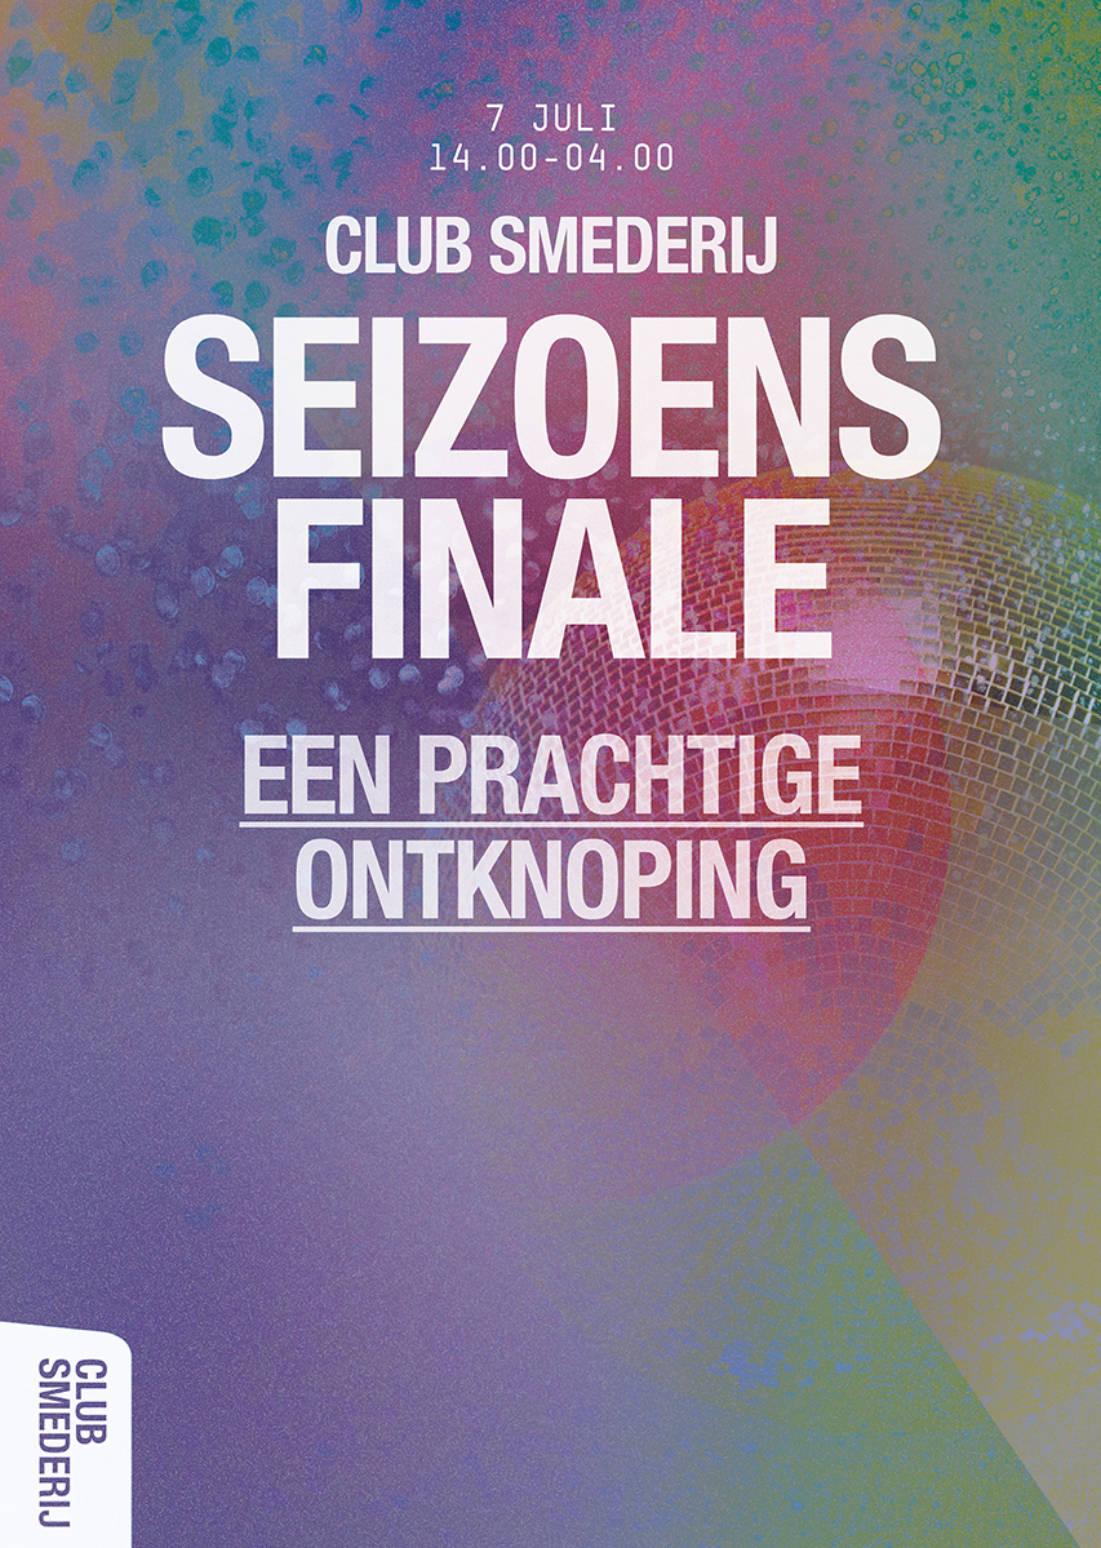 Club Smederij Seizoensfinale